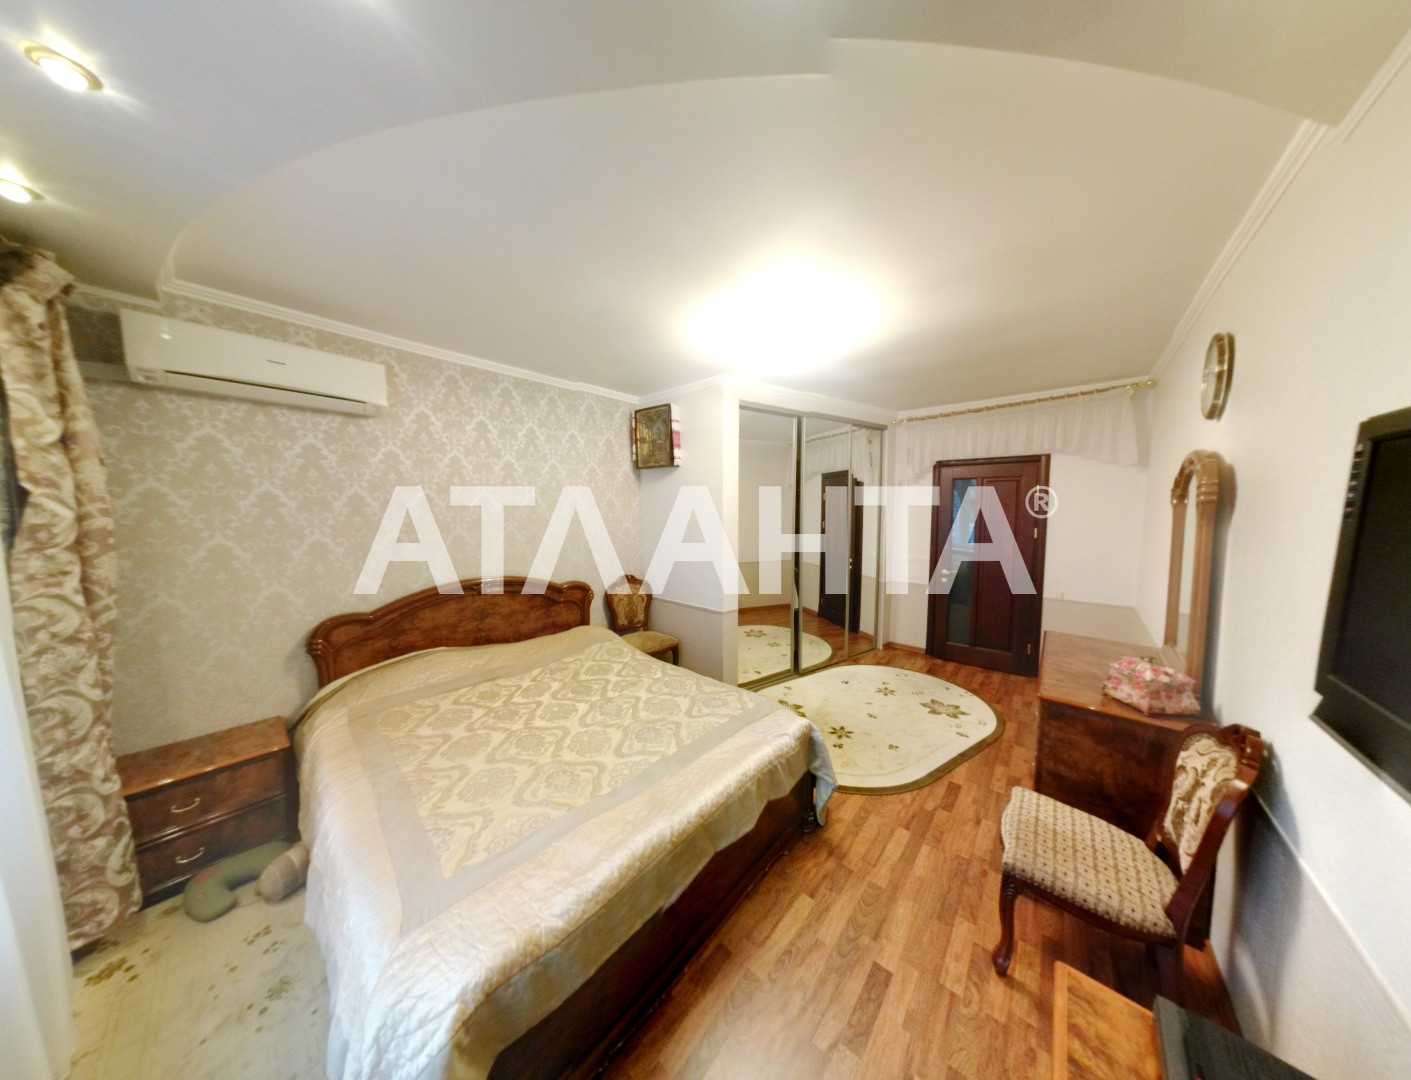 Продается 3-комнатная Квартира на ул. Ул. Ломоносова — 139 600 у.е. (фото №18)